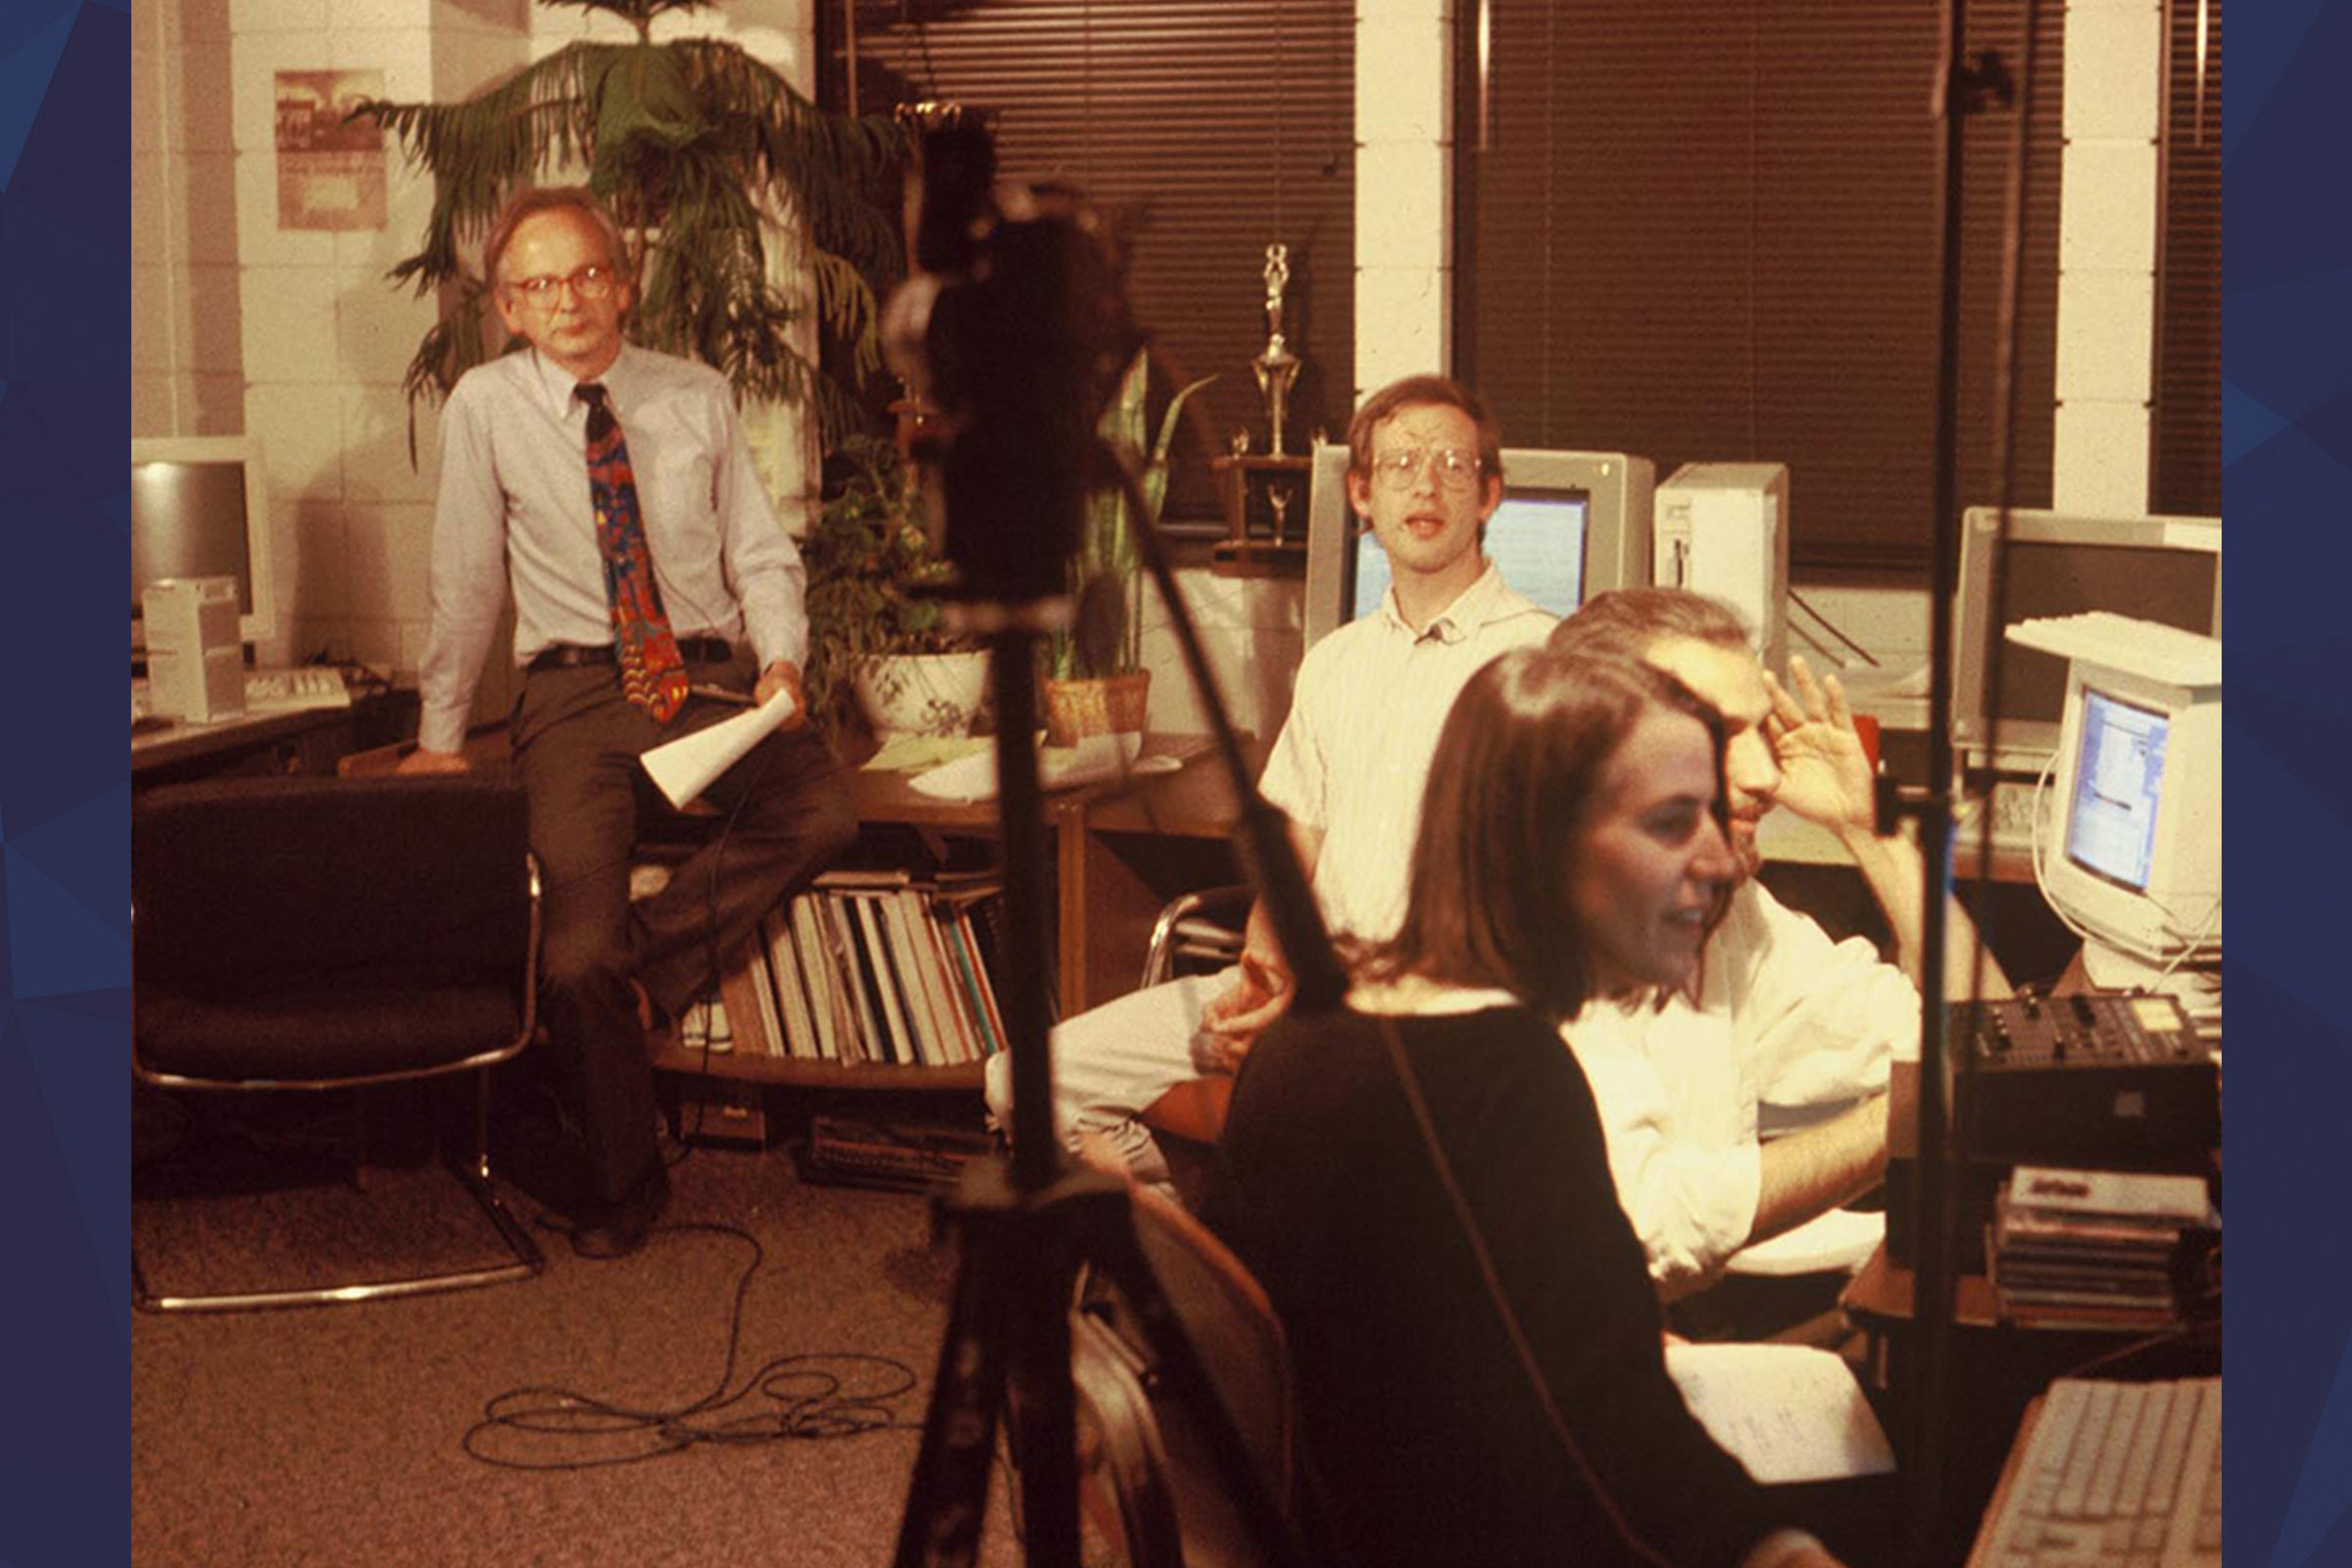 Wunderground team sitting in tv studio together